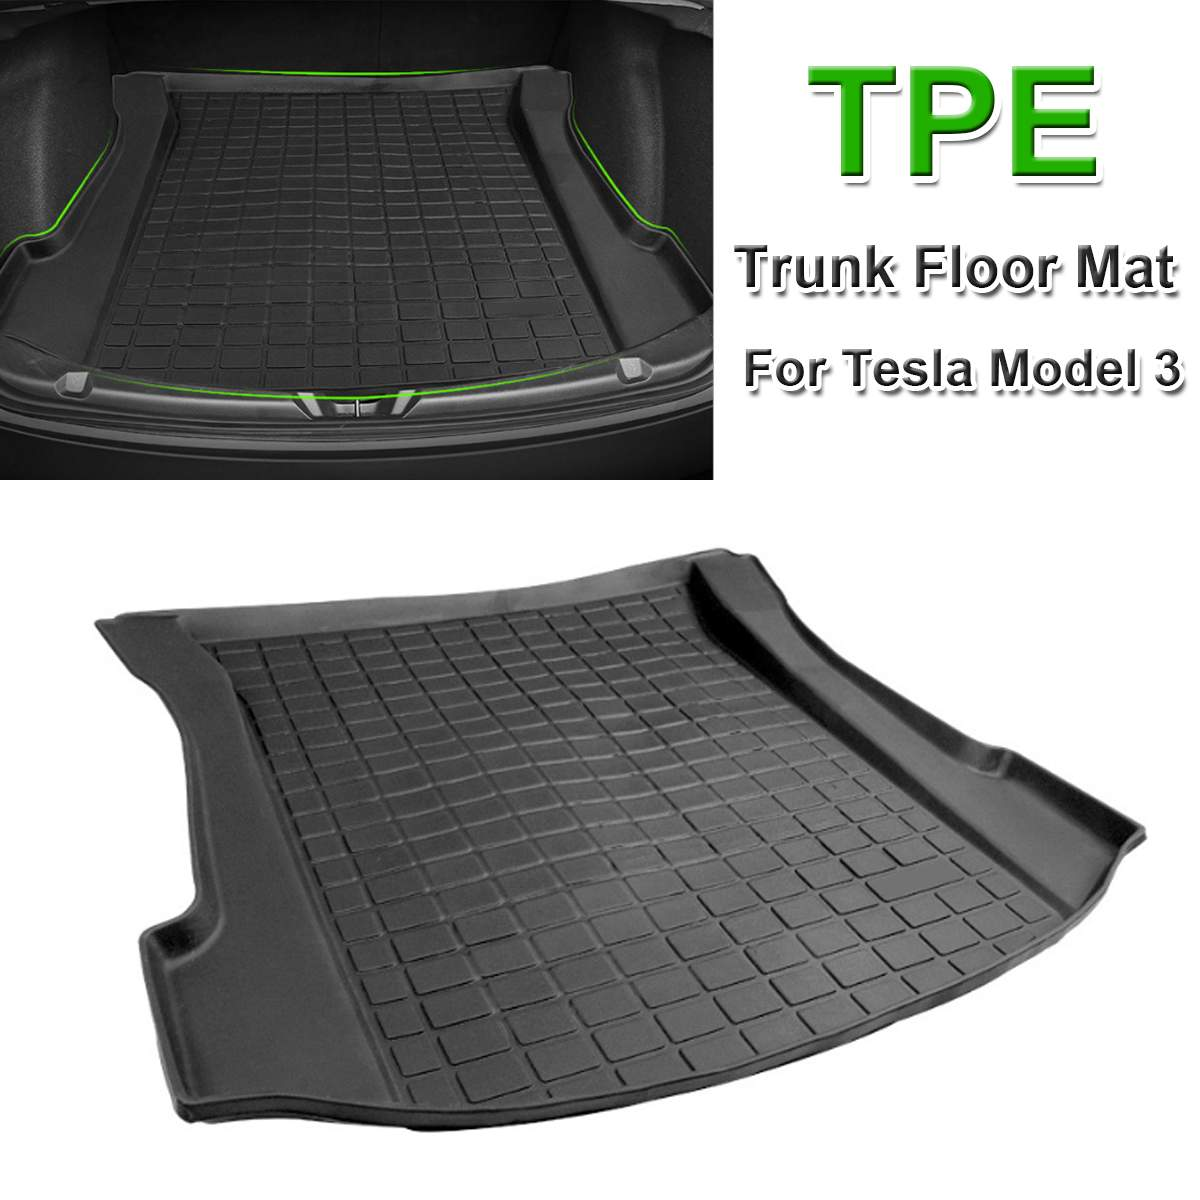 NEW 1PCS Floor Mats TPE Rear Trunk Floor Mat Black Thermoplastic Elastomer Cargo Liner Rear Tray Mat for Tesla Model 3